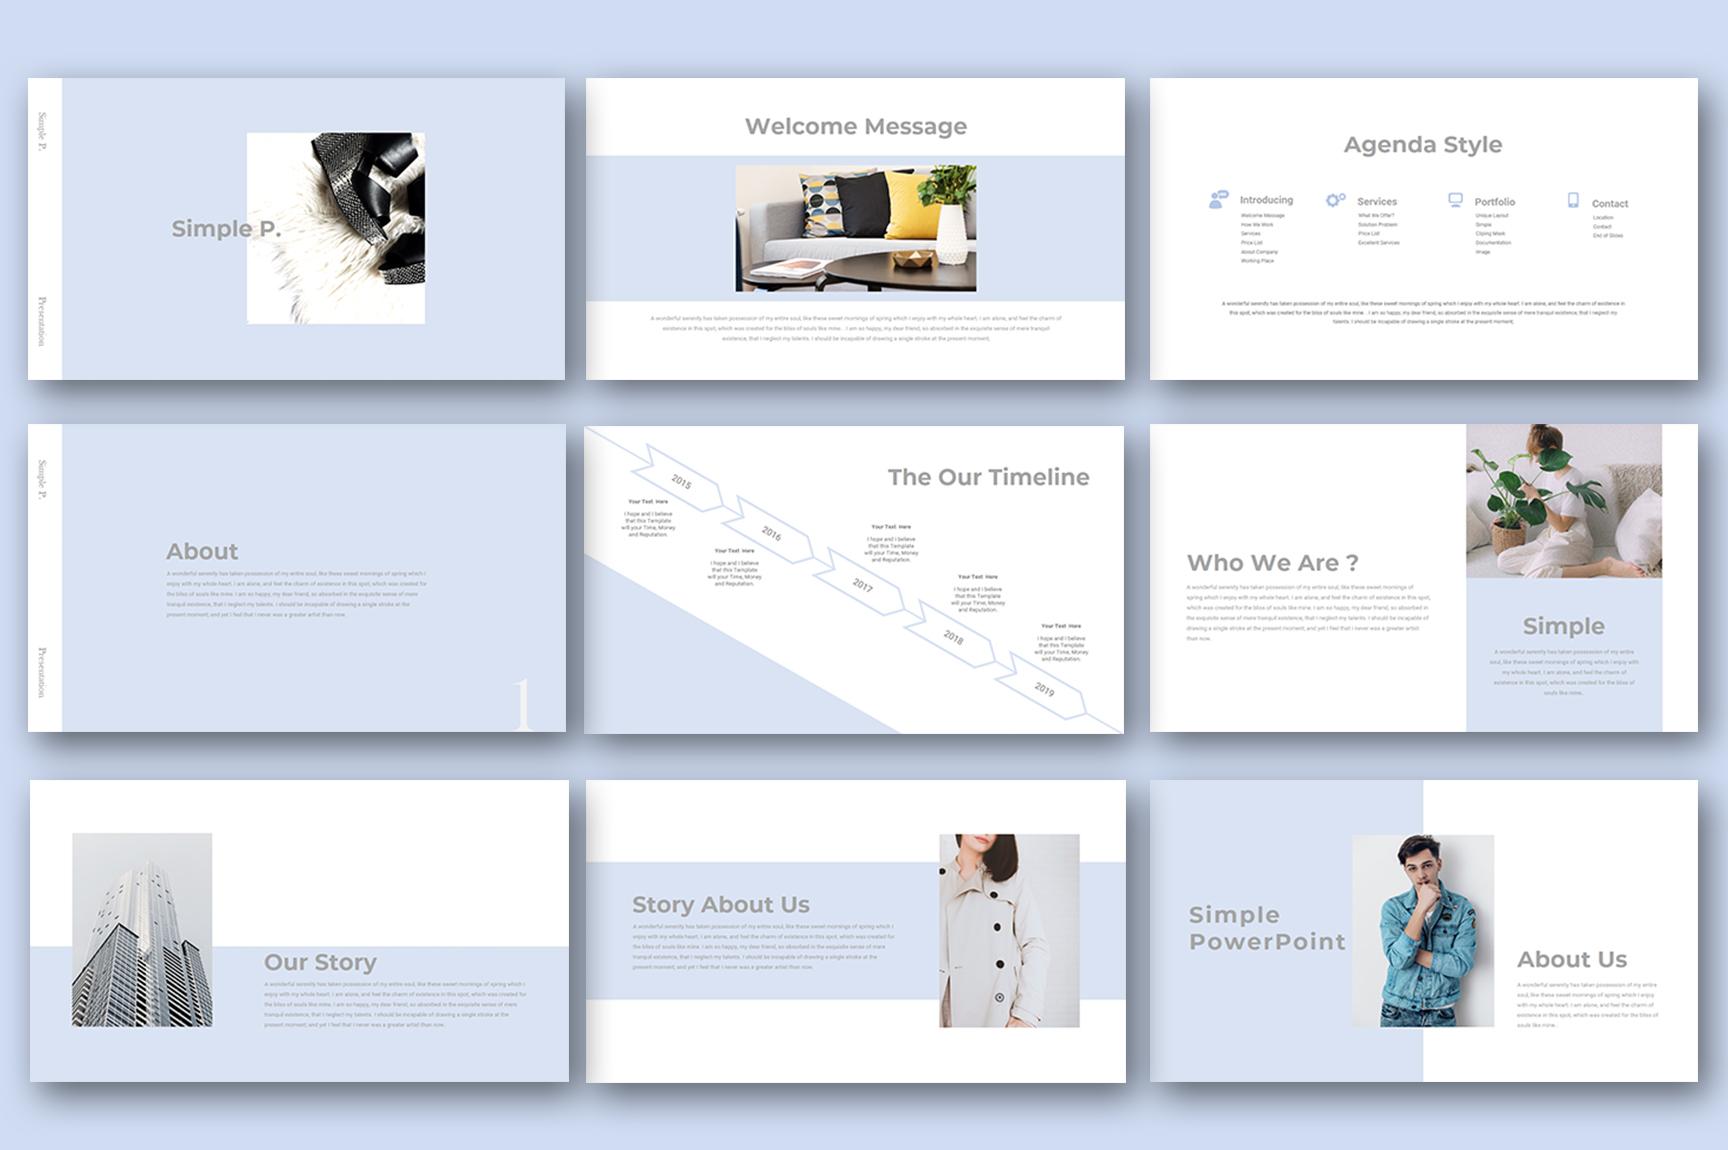 Simple P. Keynote Presentation example image 7